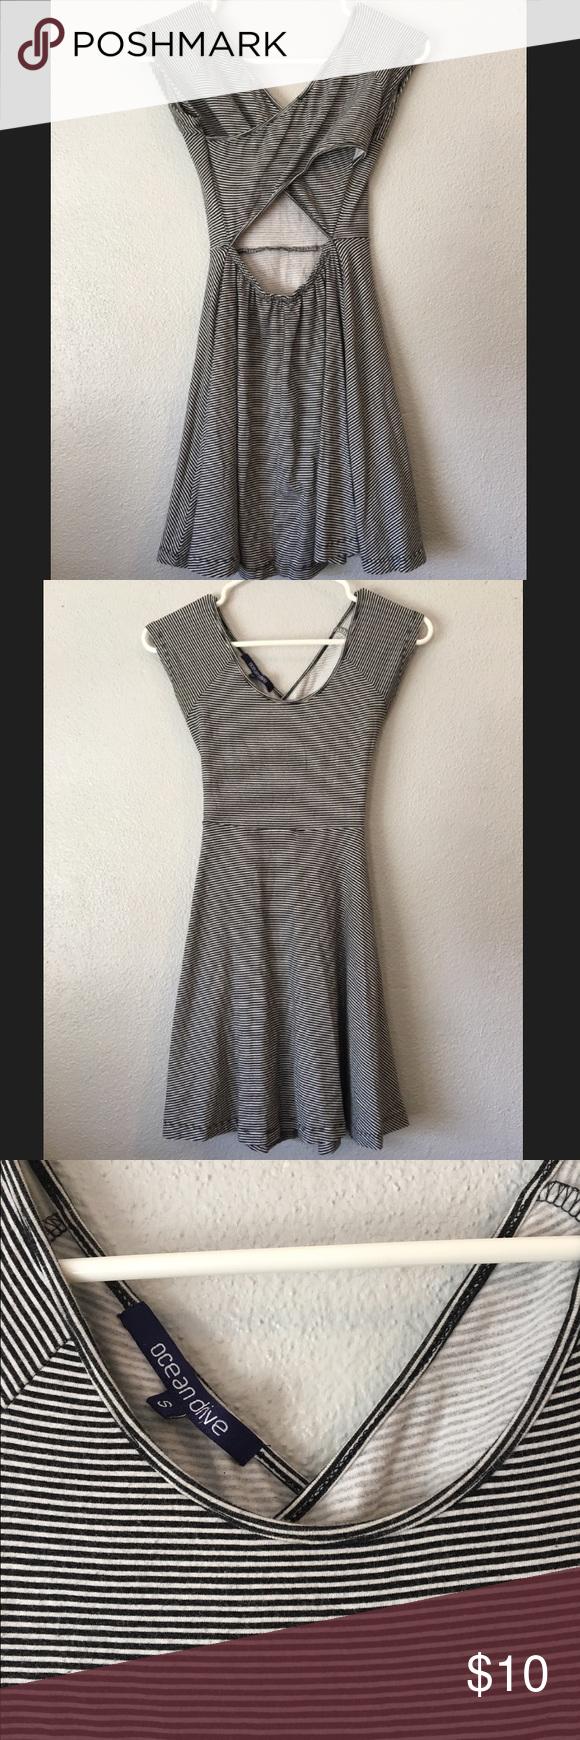 Striped skater dress open back Striped skater dress open back size small/XS Dresses Mini